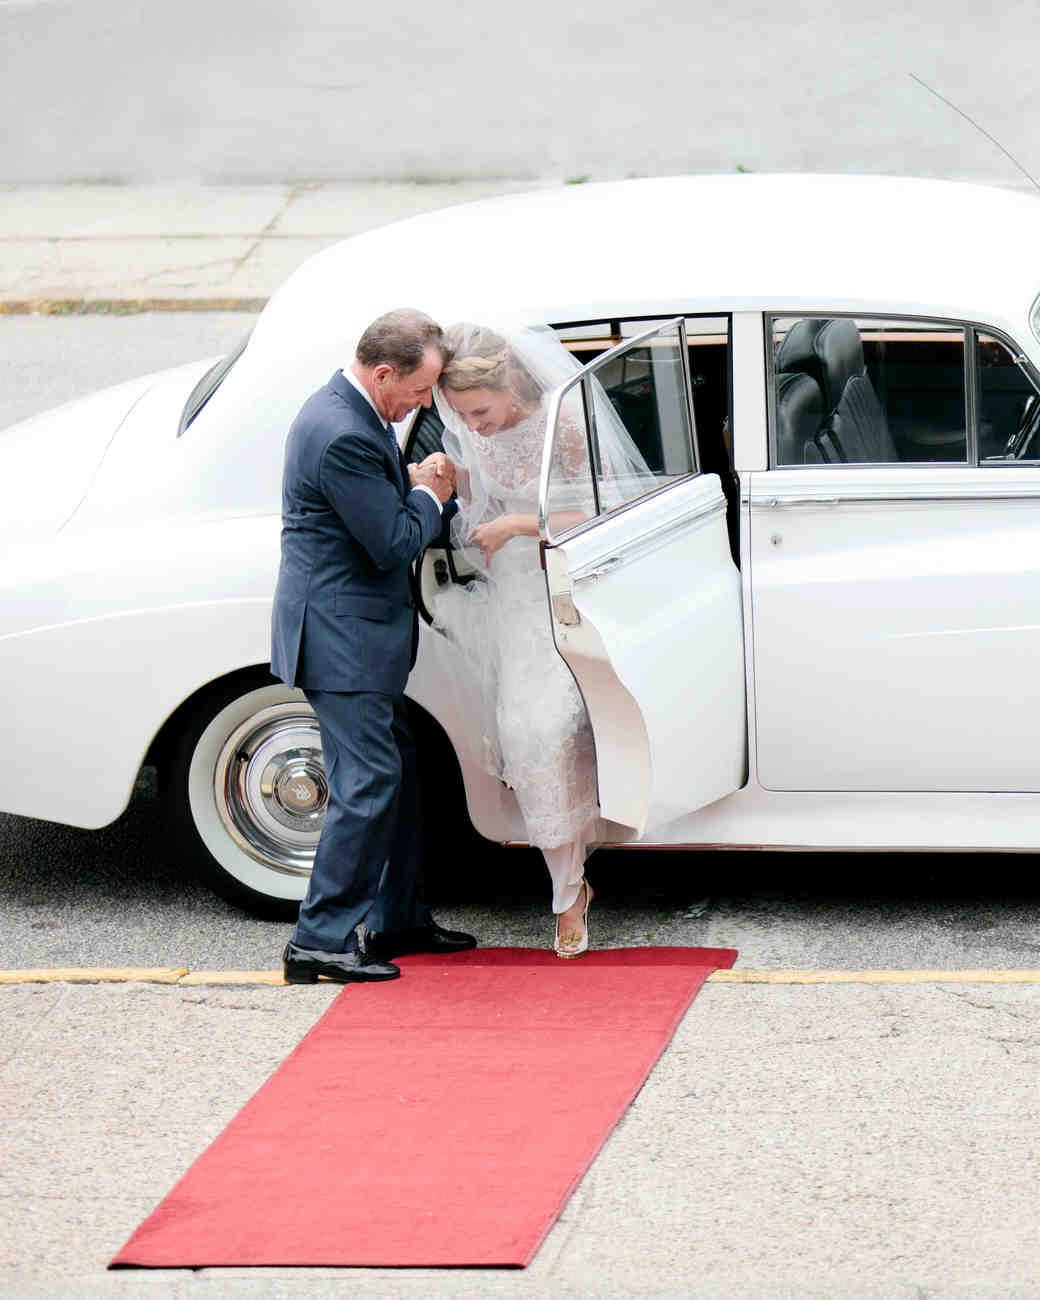 jola-tom-wedding-arriving-0614.jpg